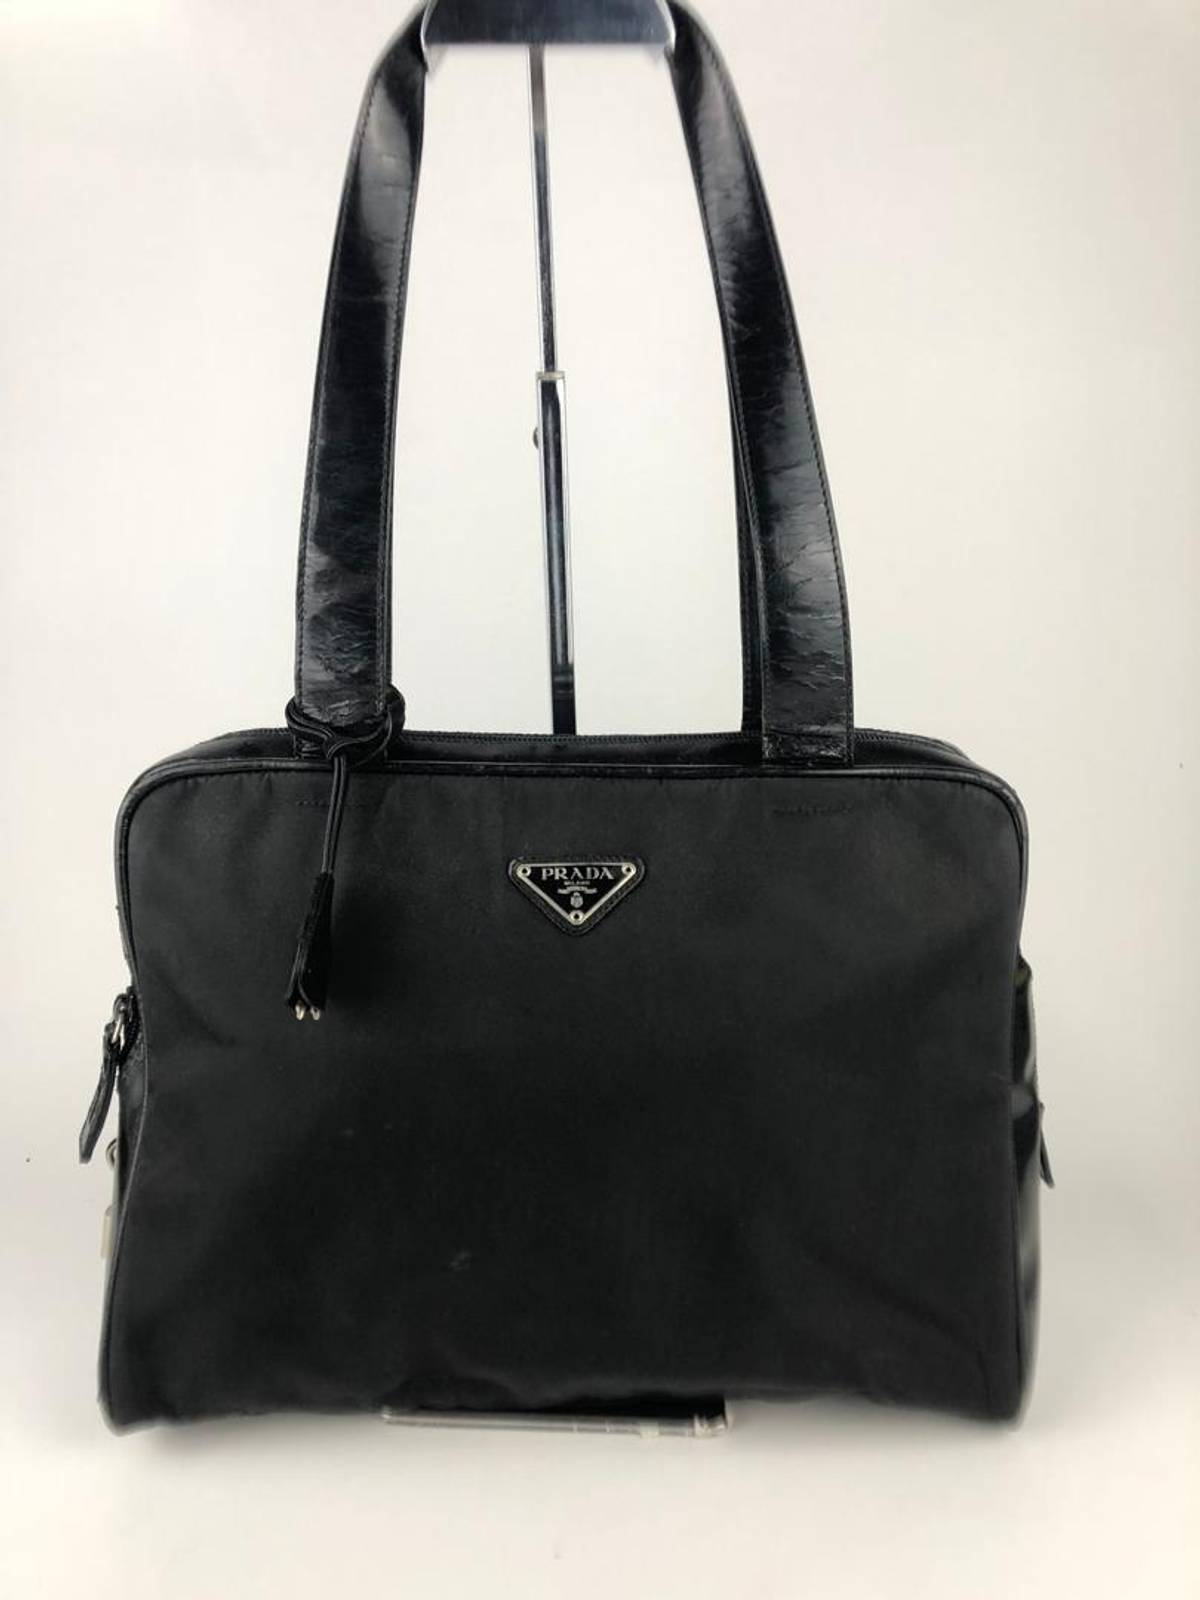 0ee8a22793c Prada Rare & Collection Authentic Prada Nylon Black Tote Bag / Prada ...